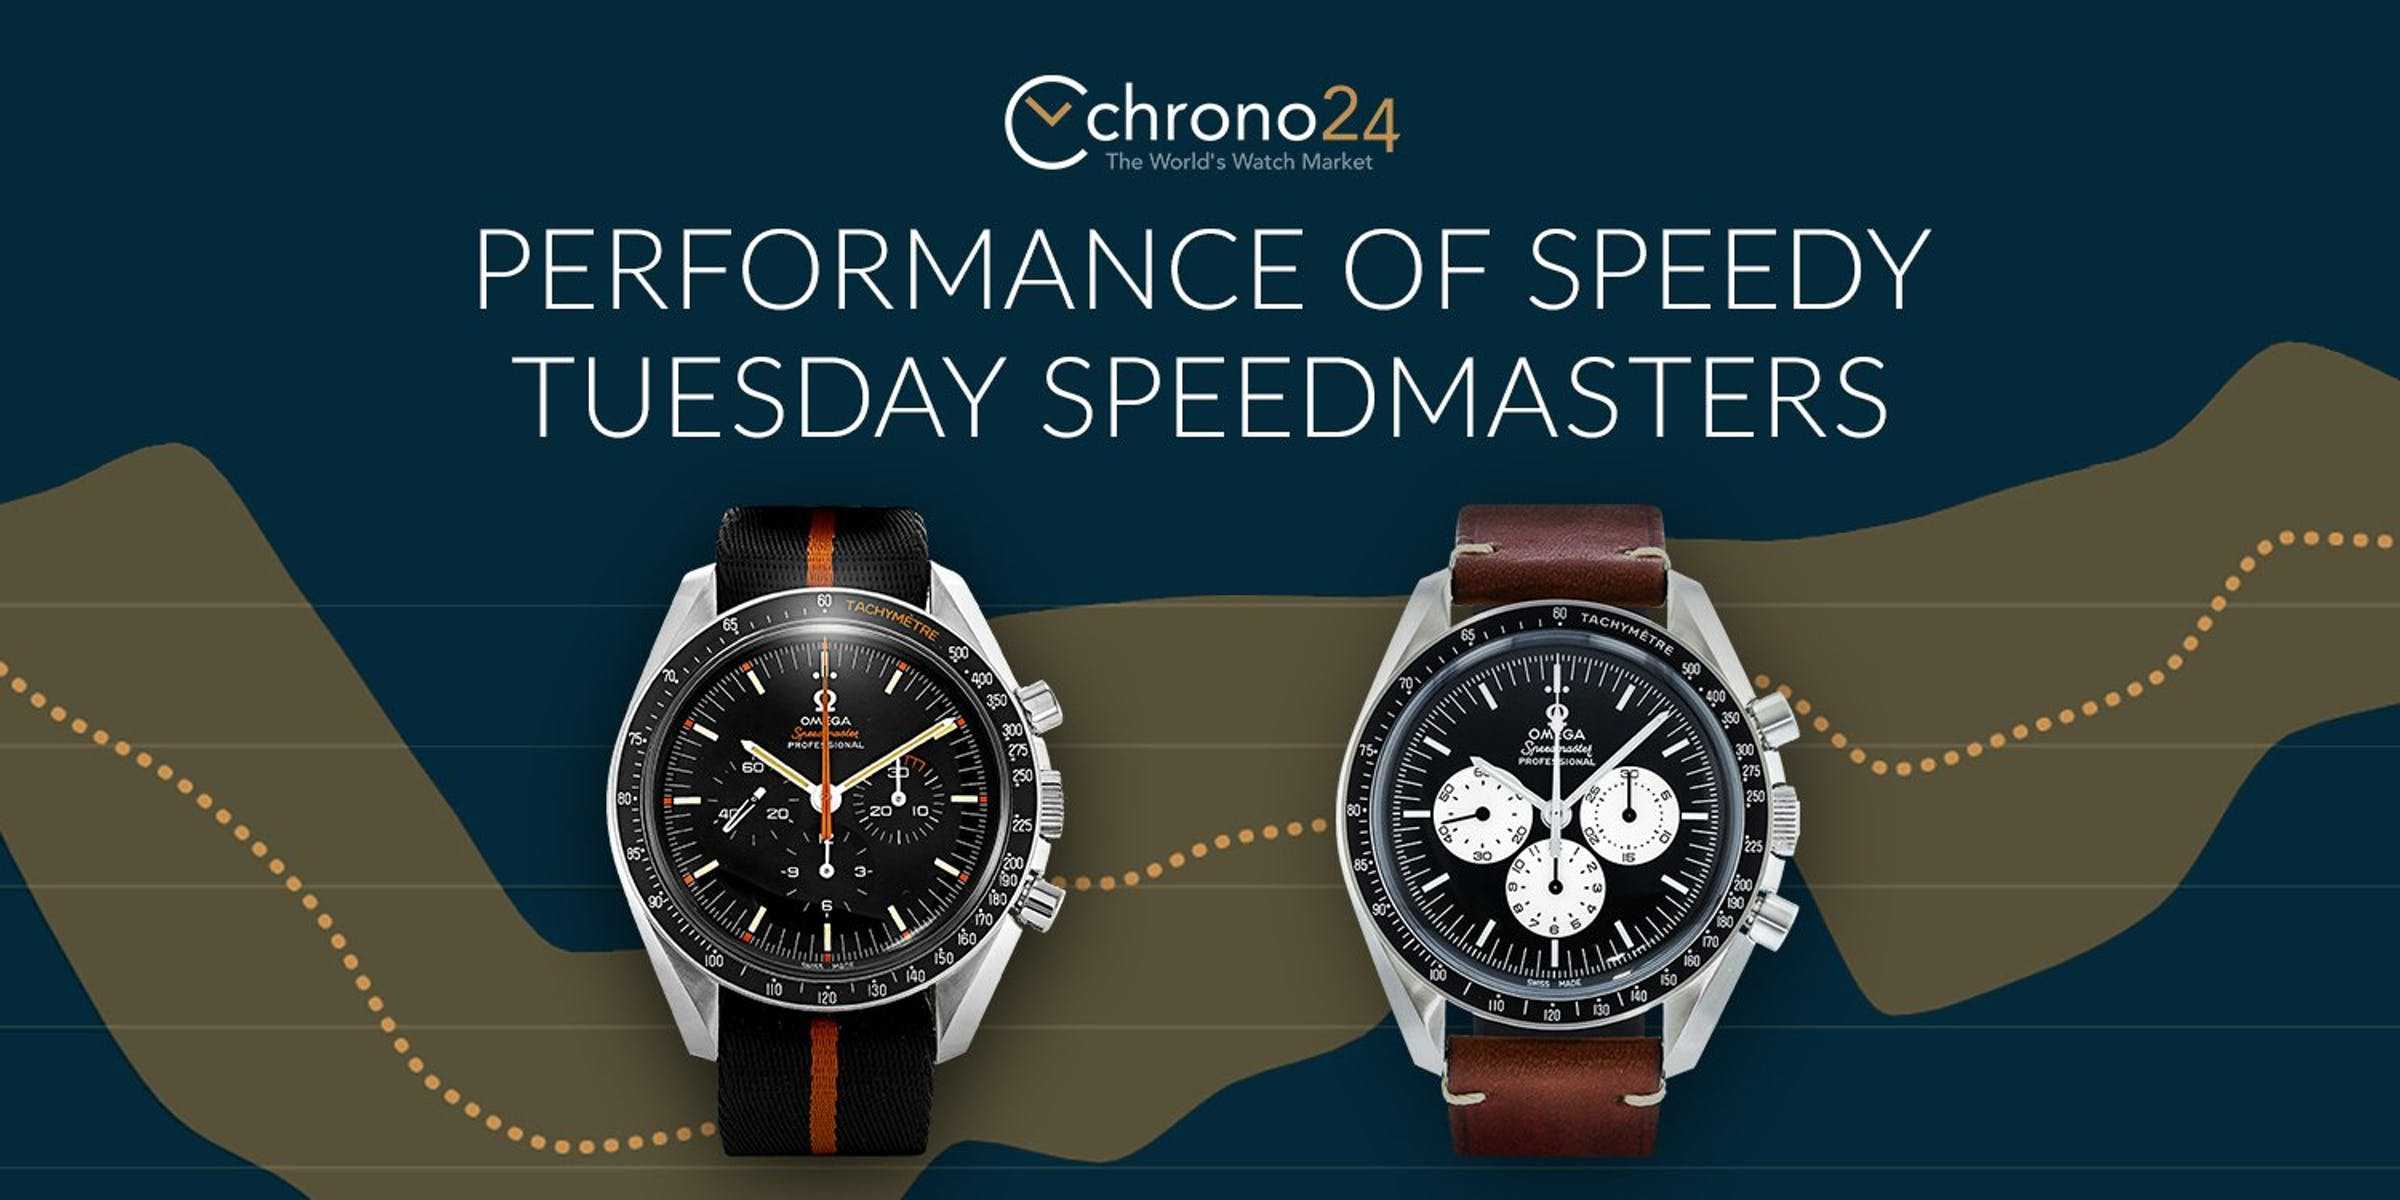 Performance of Speedy Tuesday Speedmasters